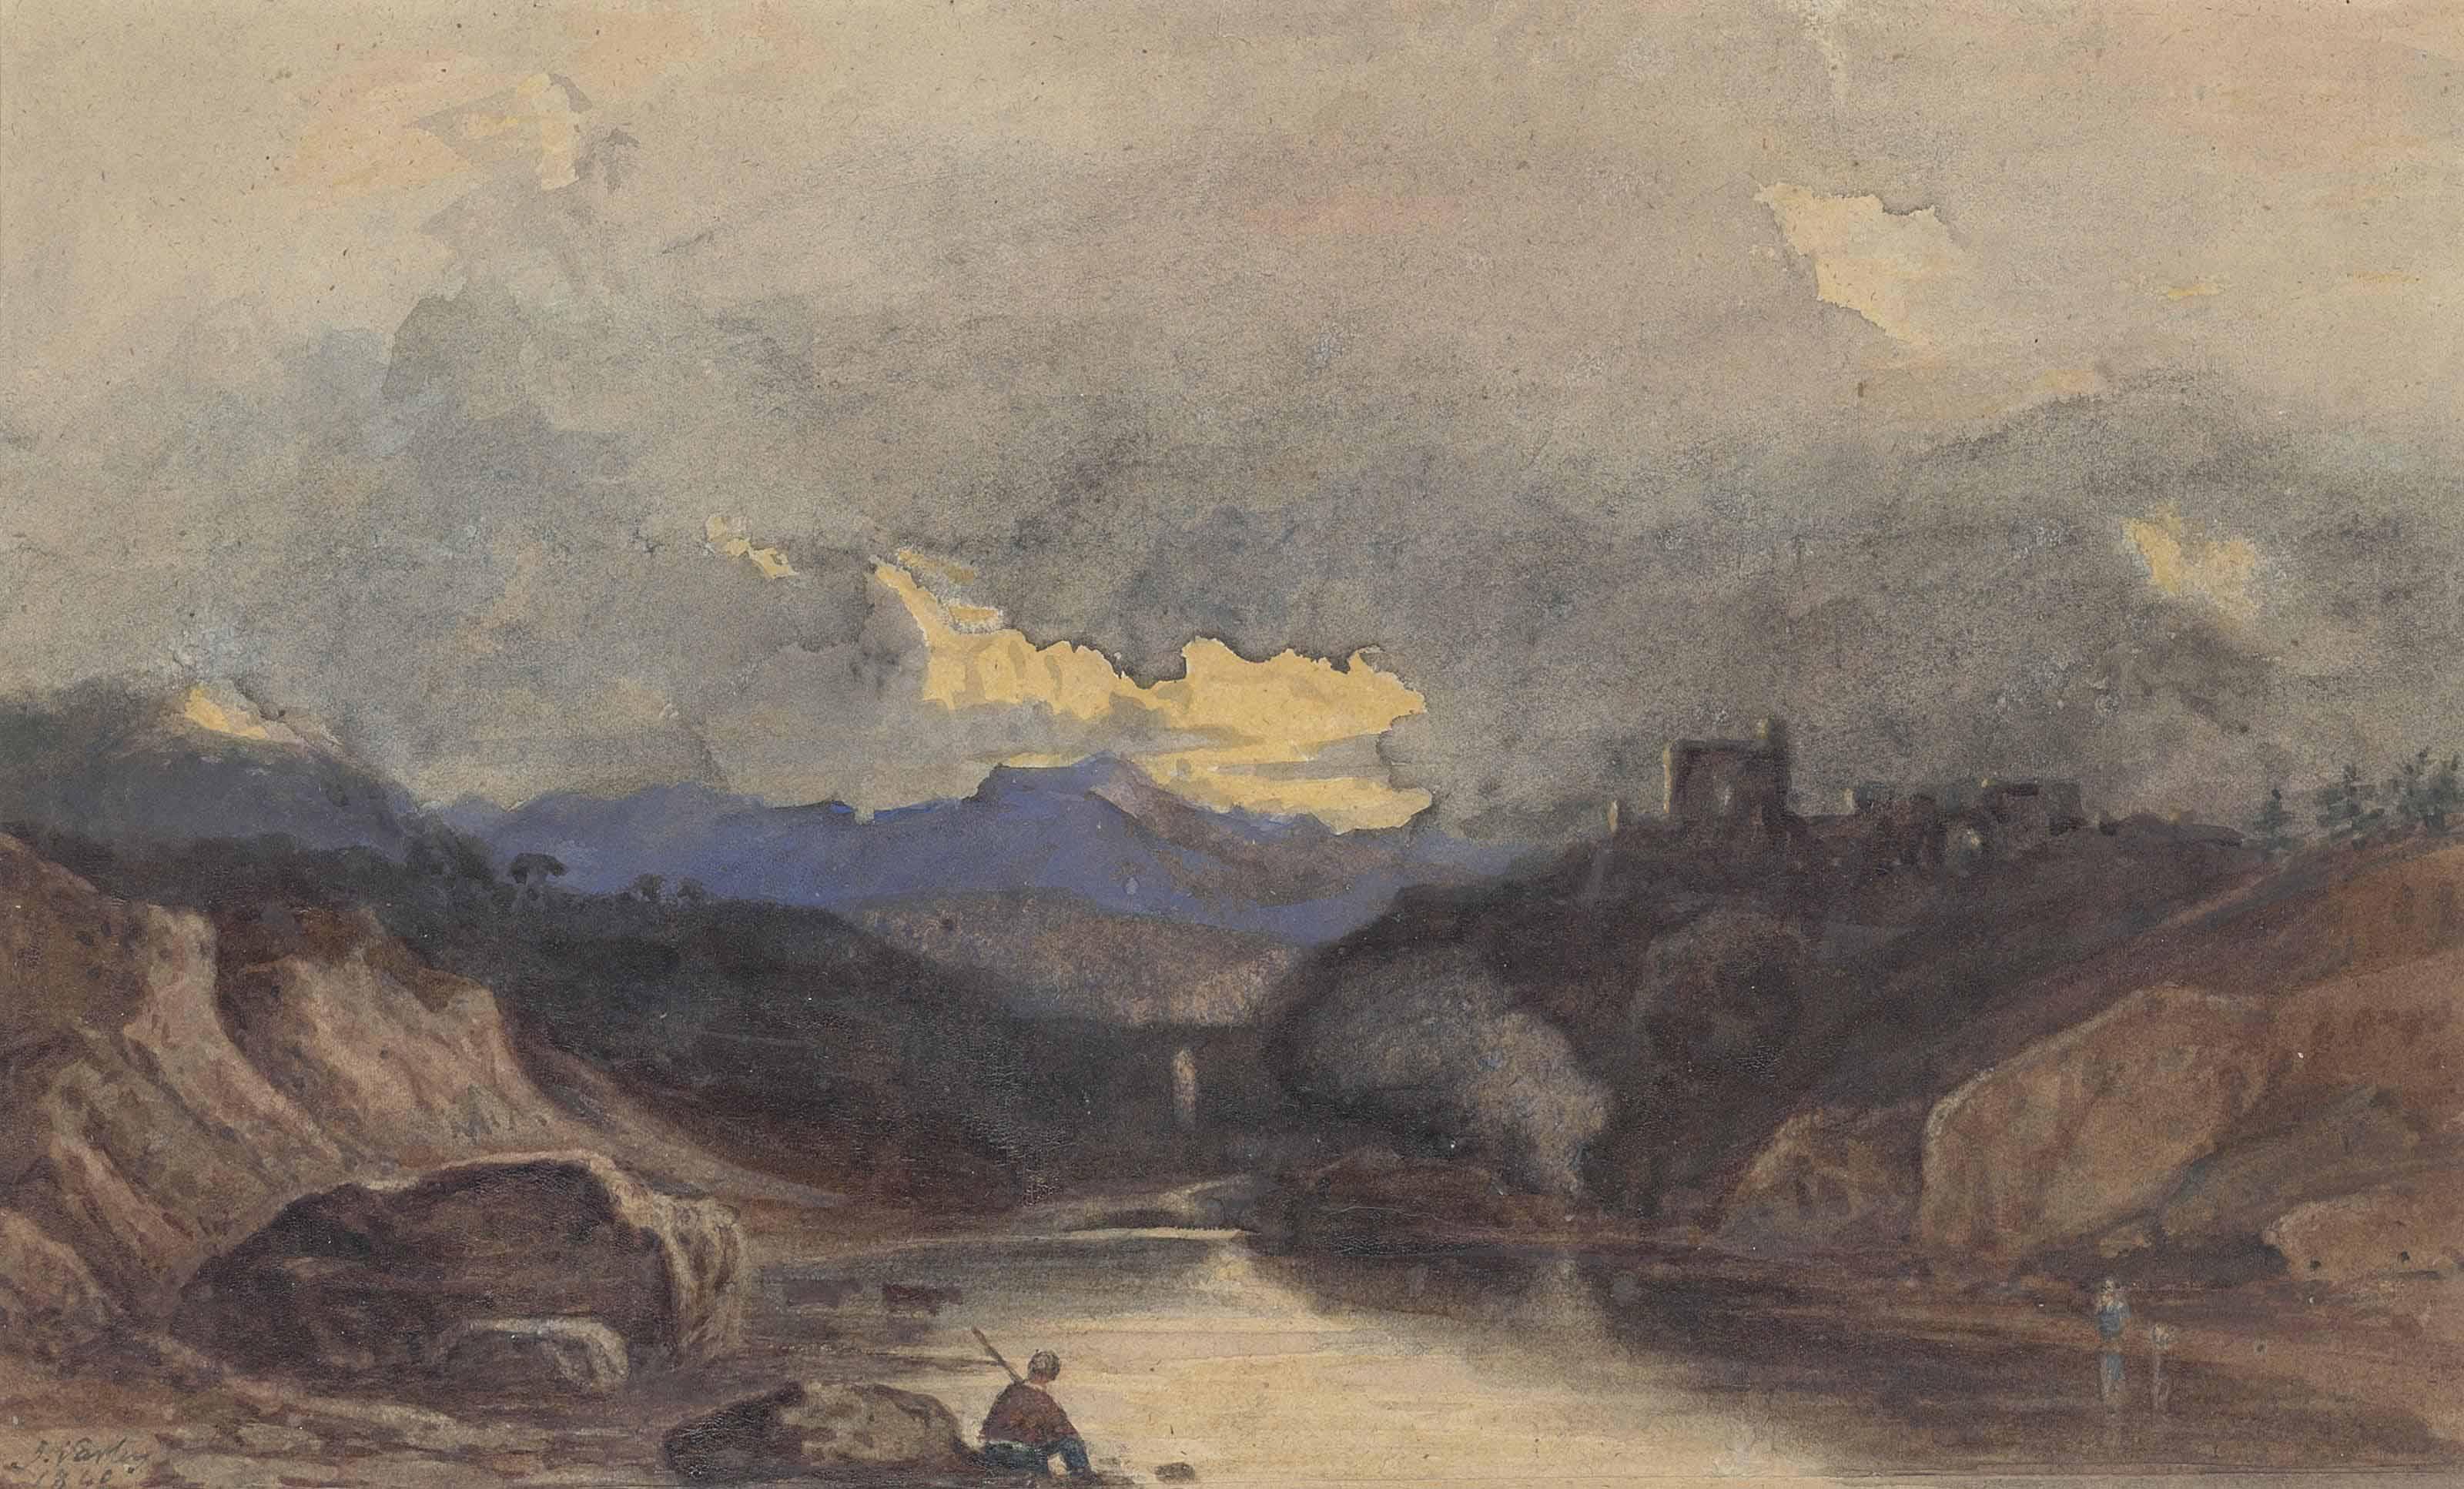 John Varley, O.W.S. (Hackney 1